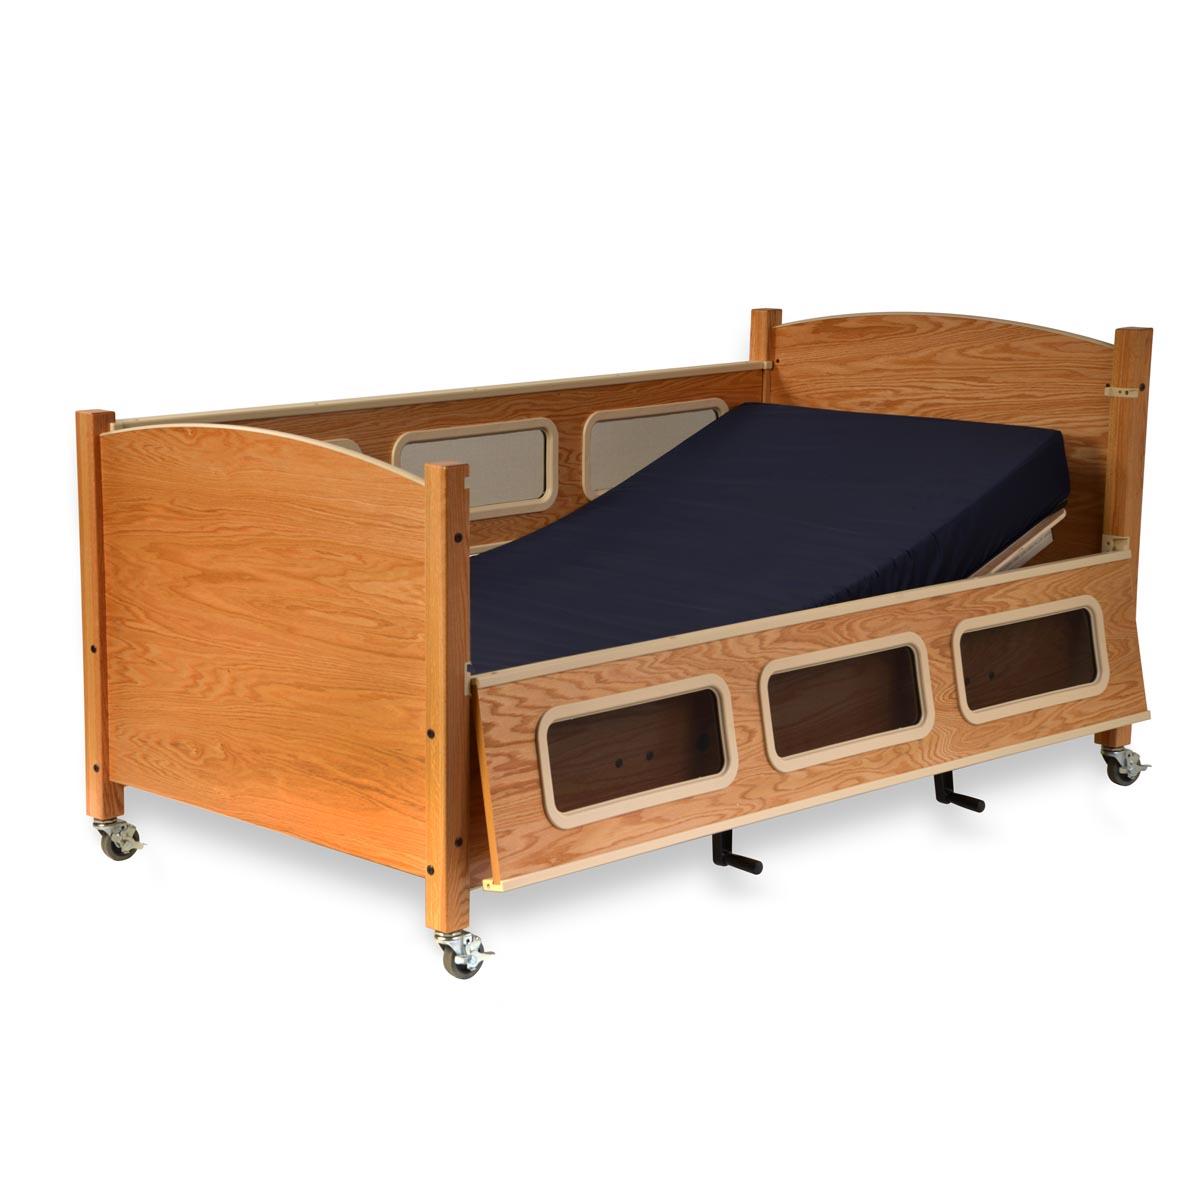 SleepSafe low bed - hi-lo